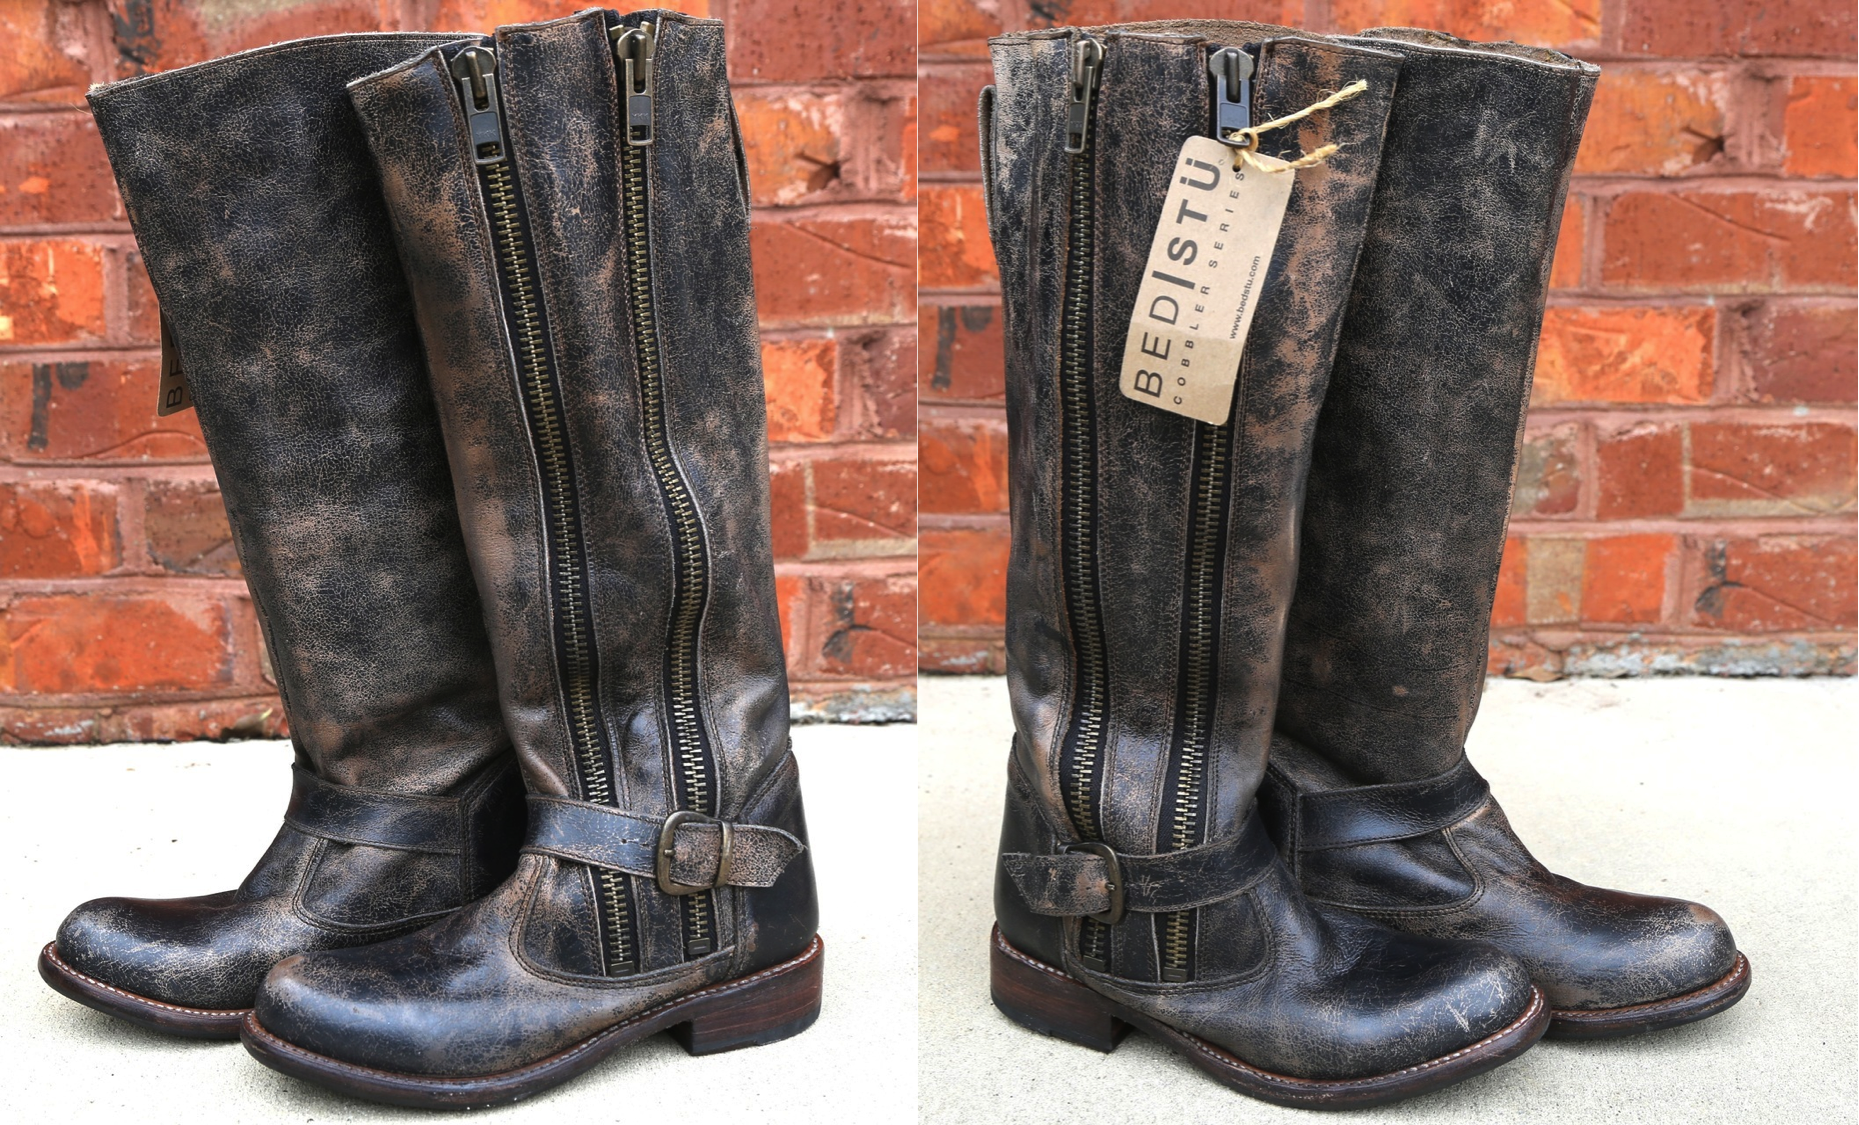 Buy Bed Stu Cowboy Boots Bed Stu Boots Rivertrail